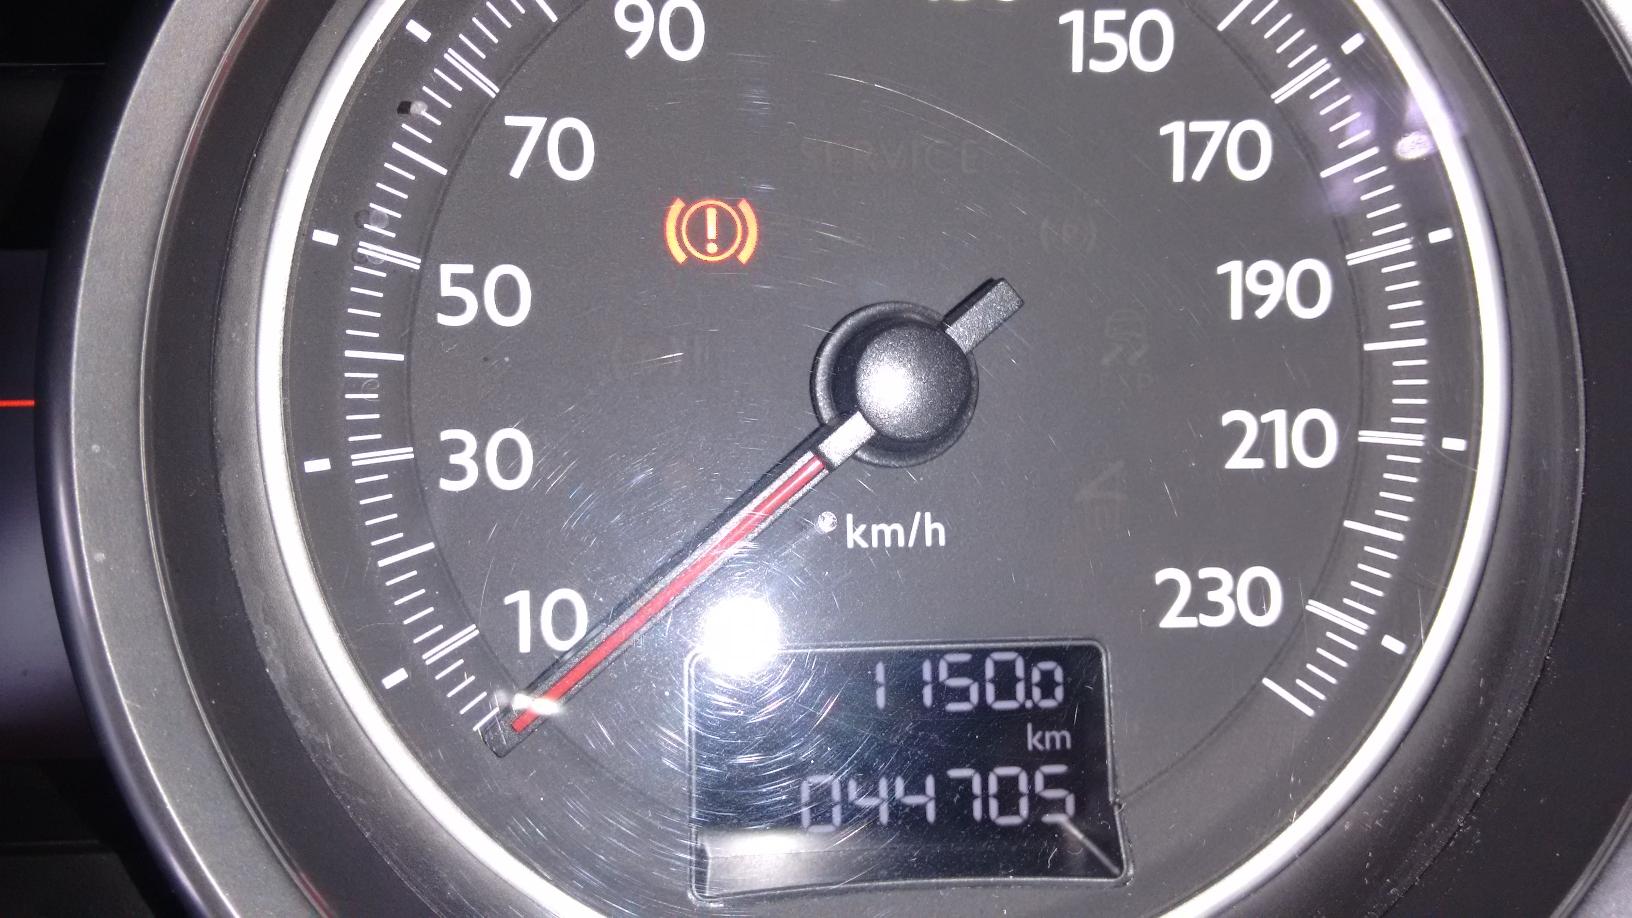 PEUGEOT 508 SEDAN 1.6 THP 16V  TIPTRONIC